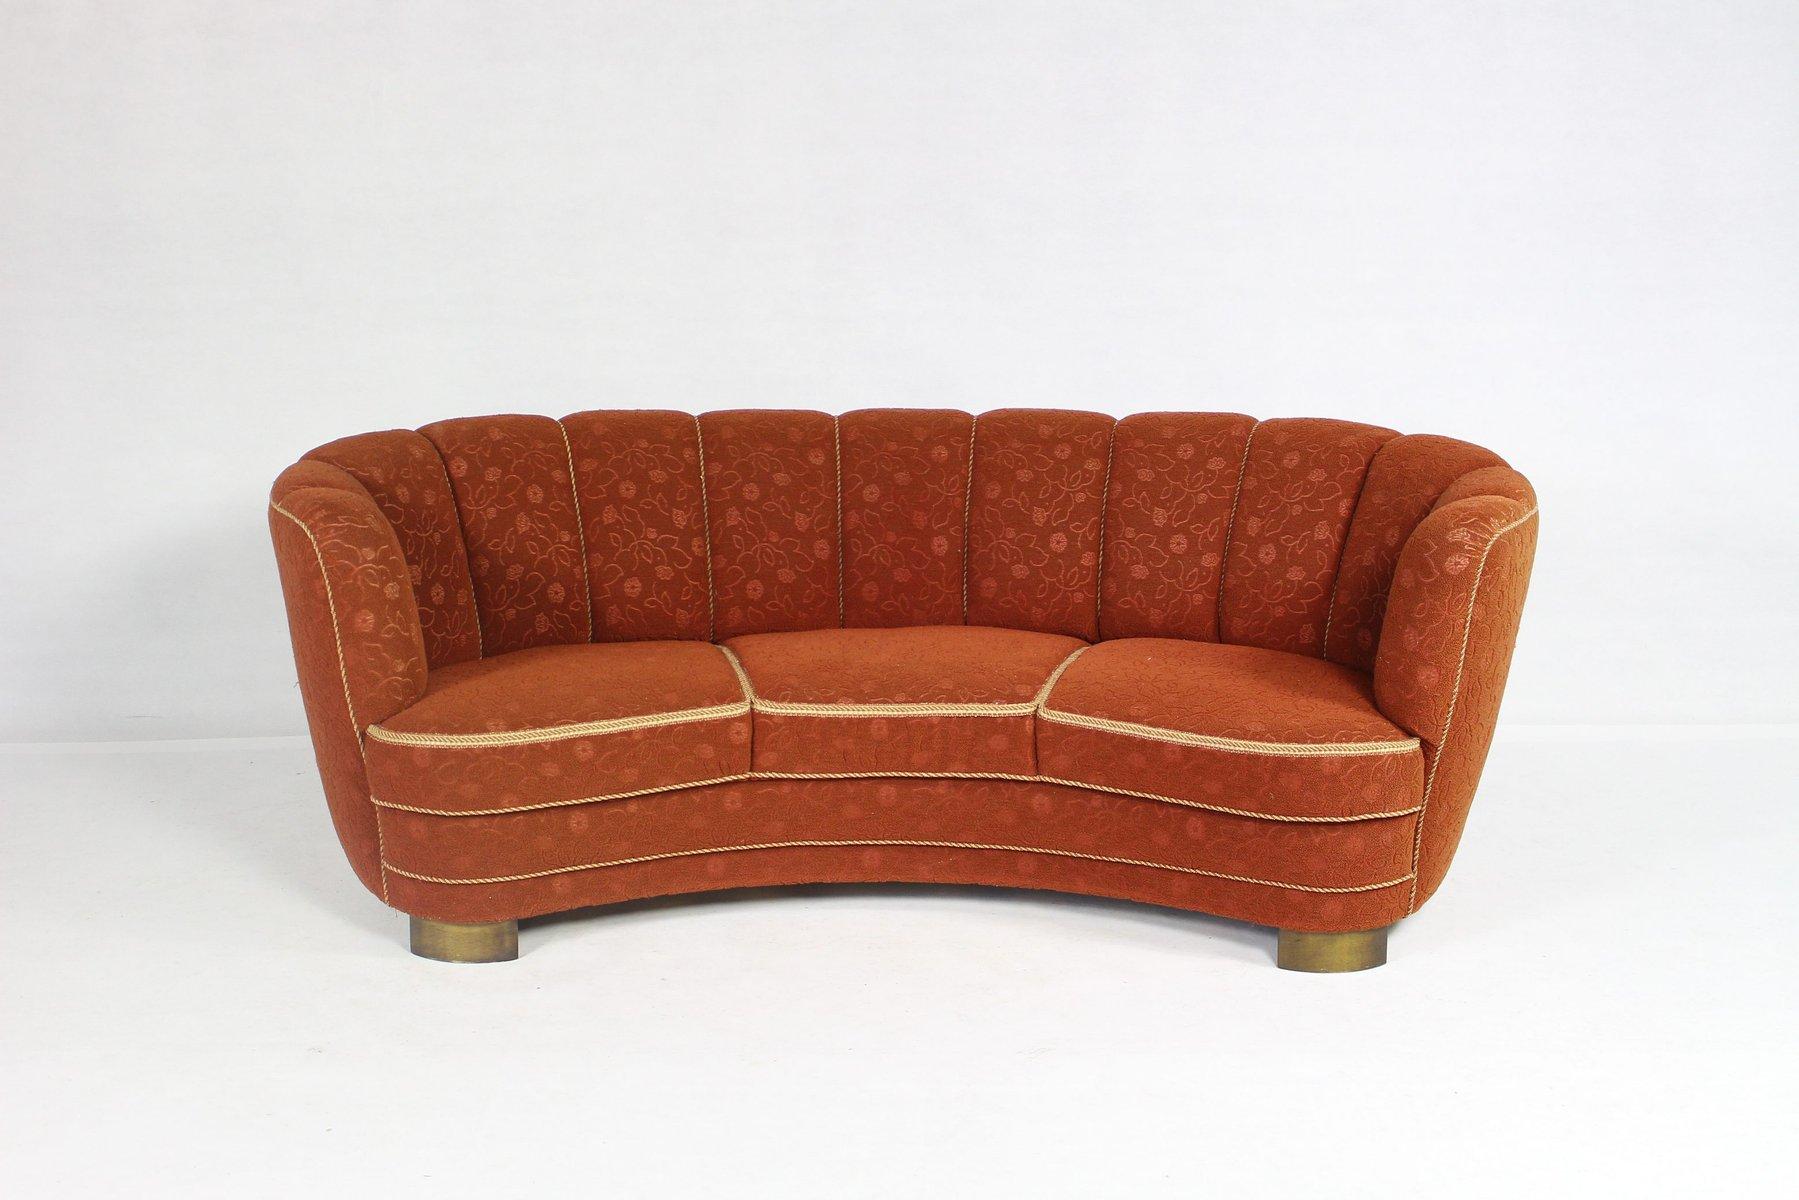 gebogenes vintage banana sofa bei pamono kaufen. Black Bedroom Furniture Sets. Home Design Ideas